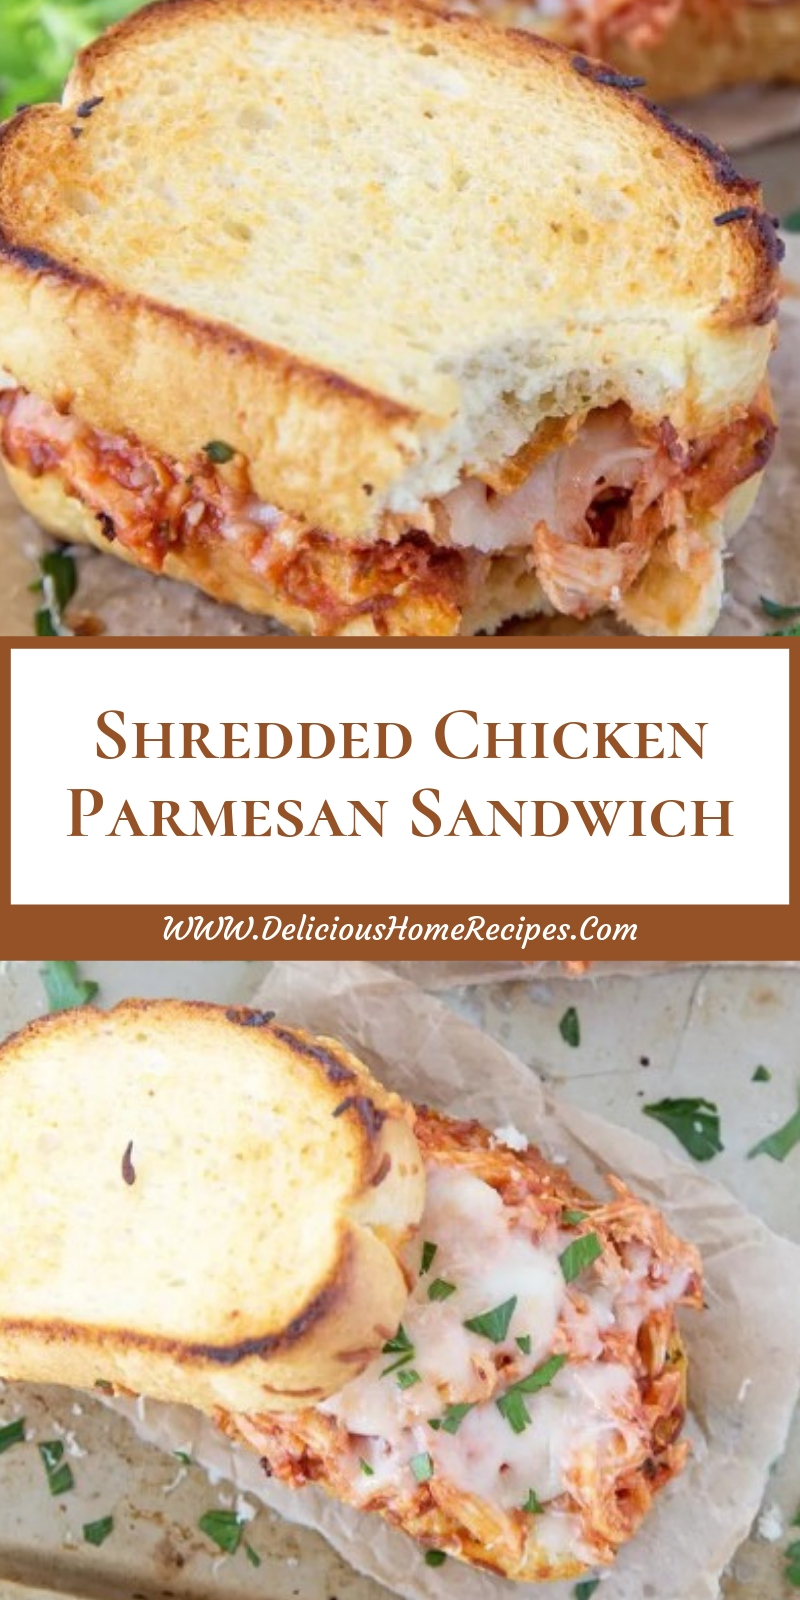 Shredded Chicken Parmesan Sandwich